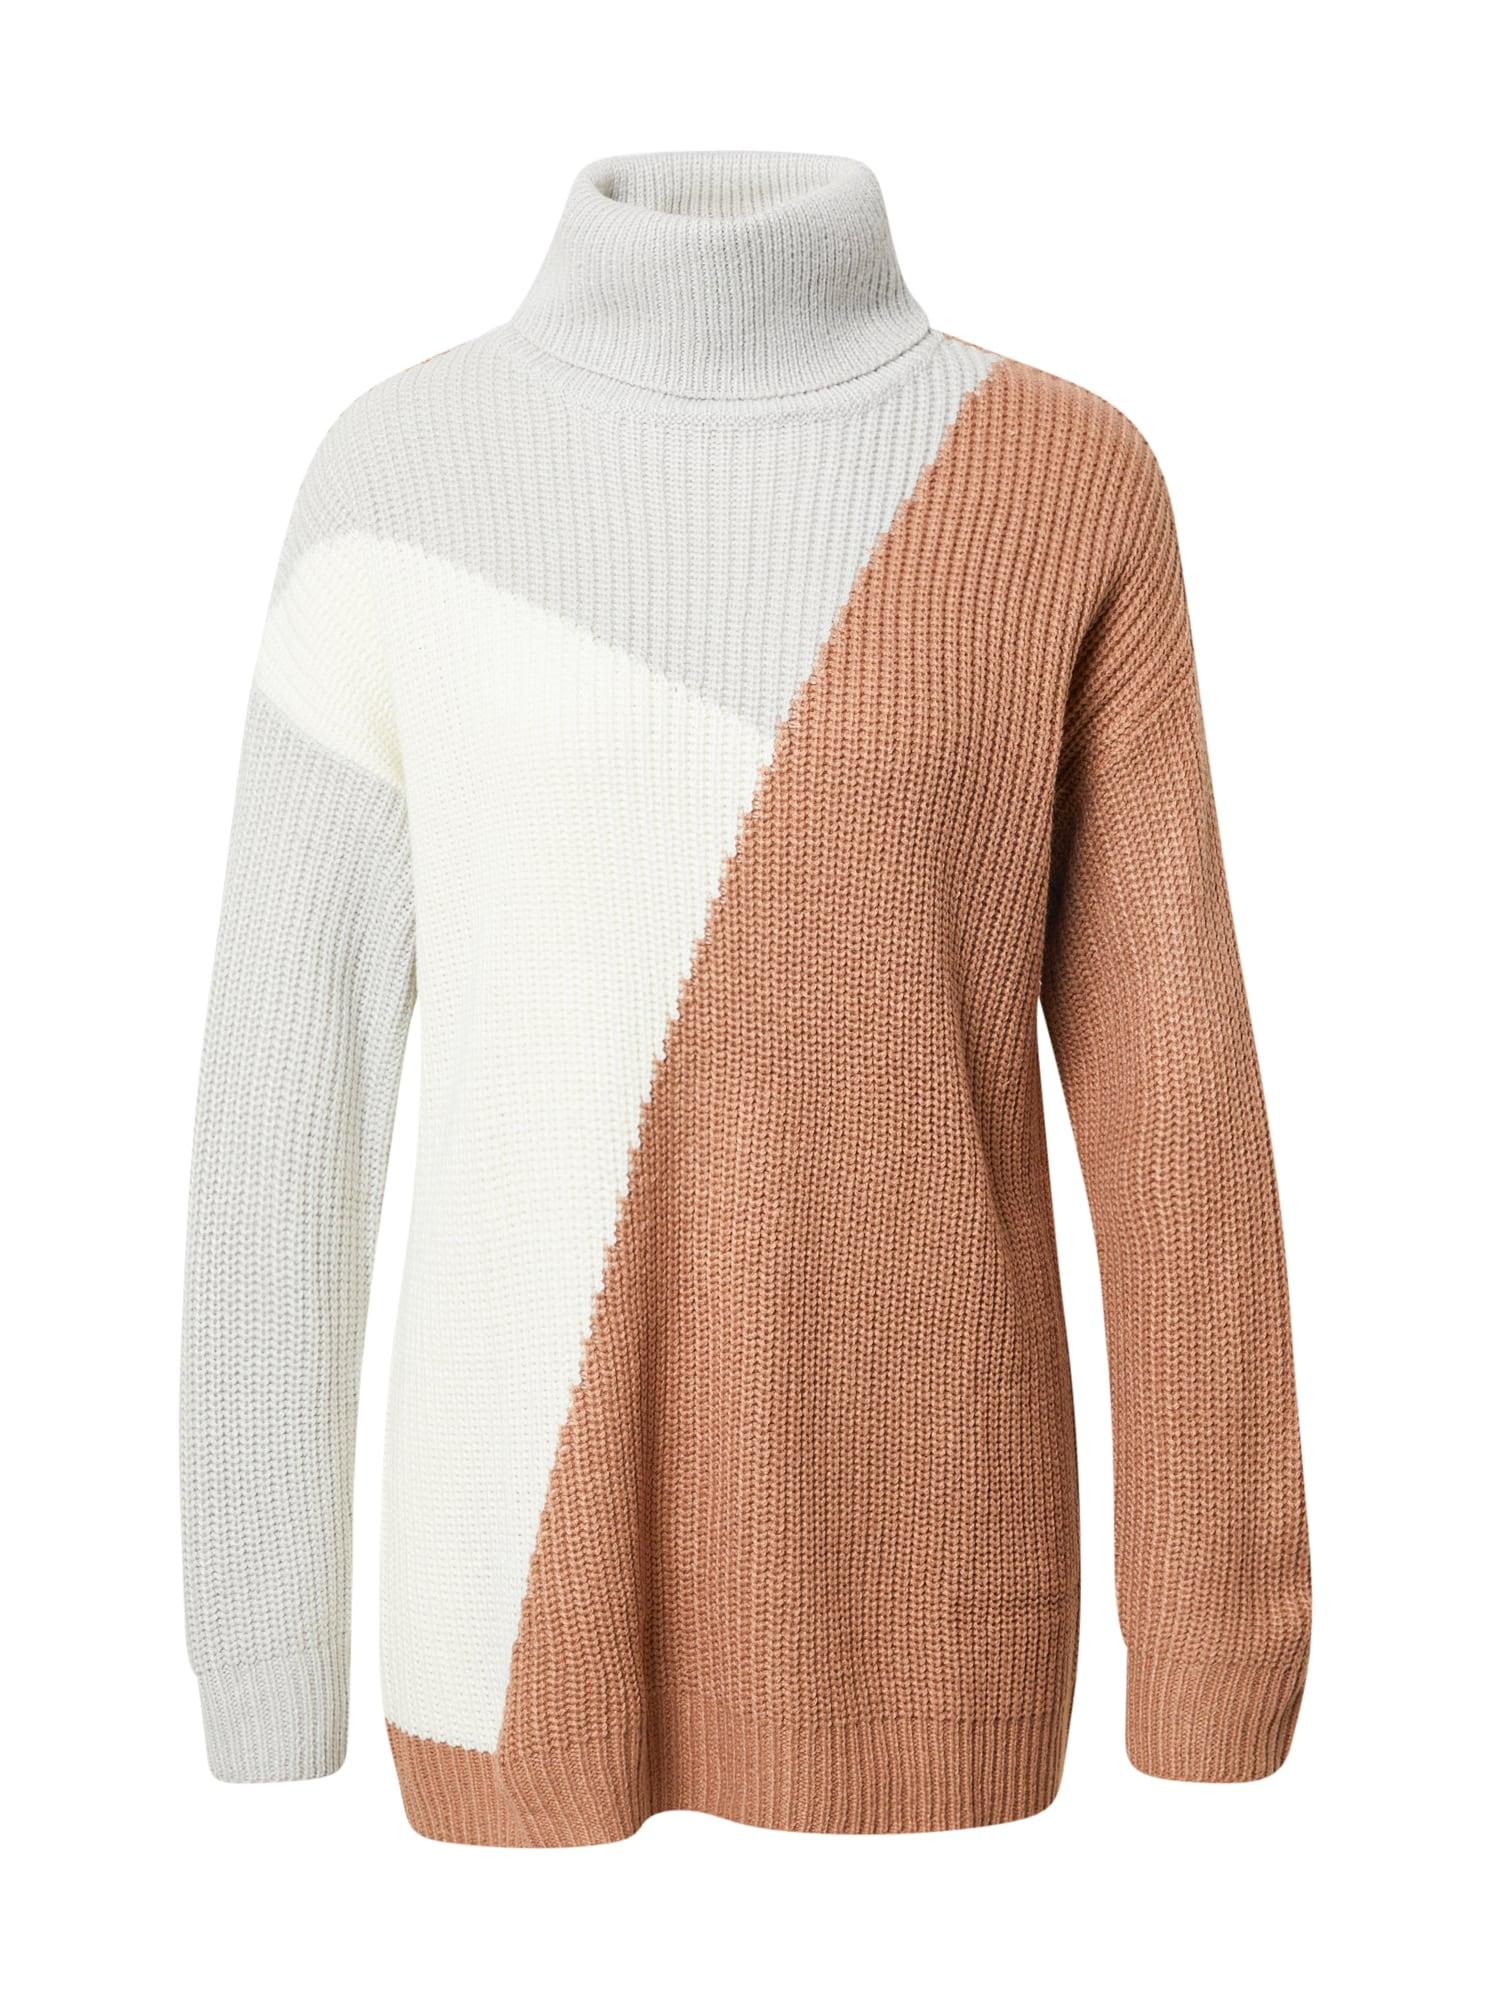 AX Paris Megztinis pilka / ruda / balta